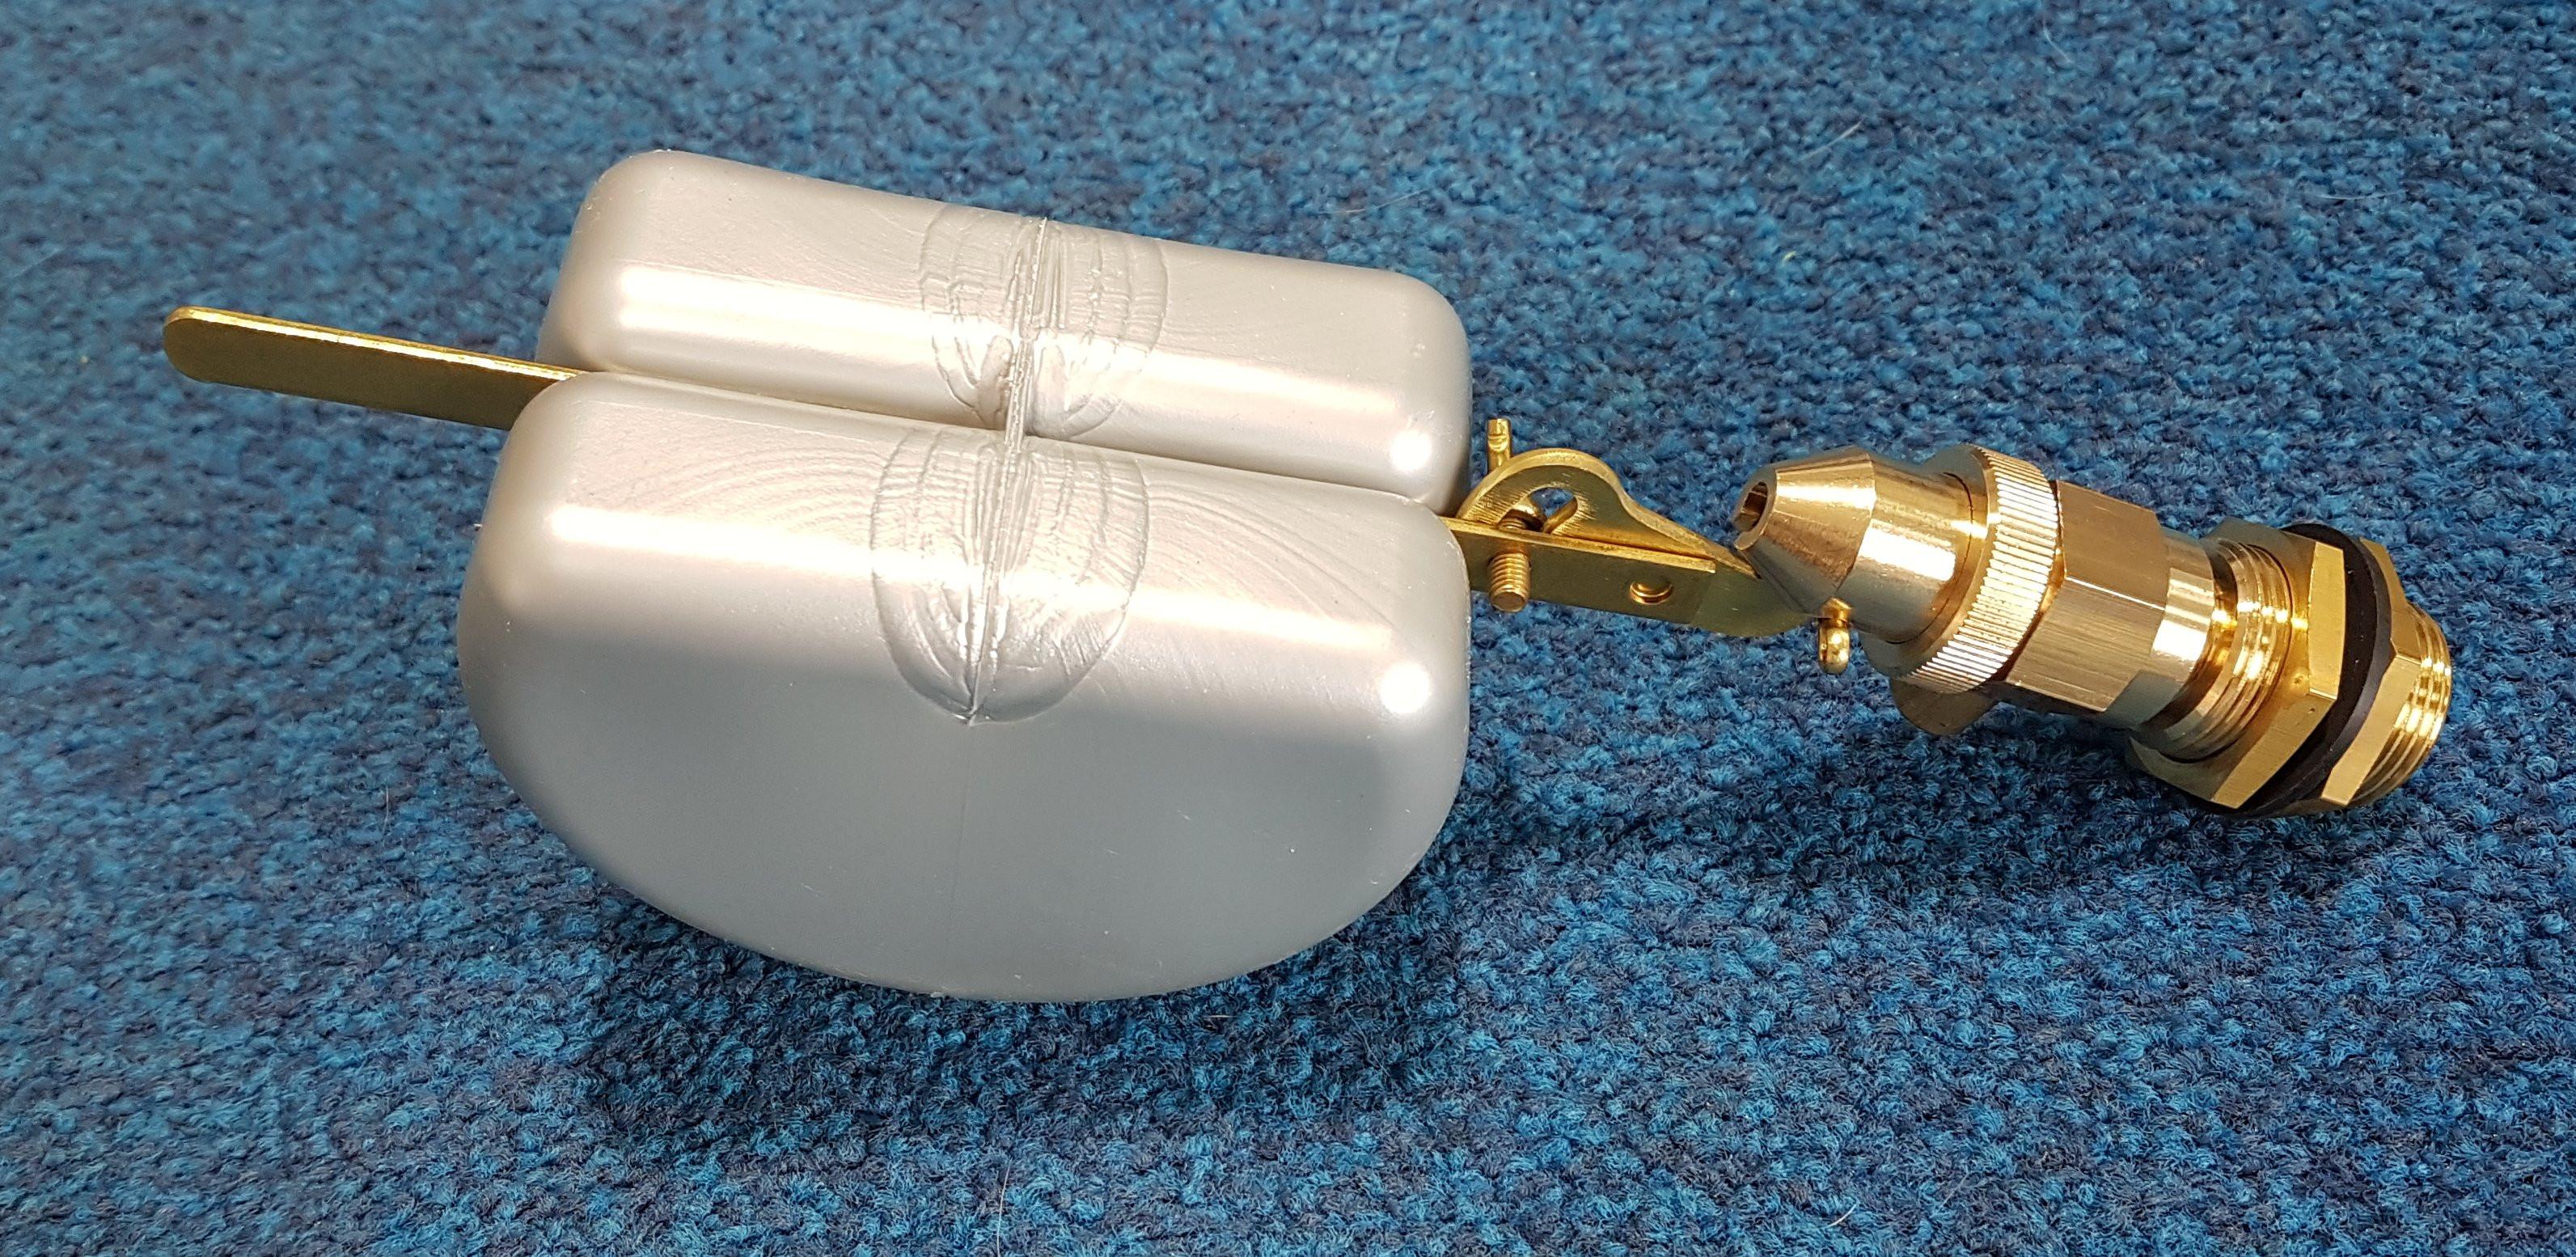 Float valve 169-167